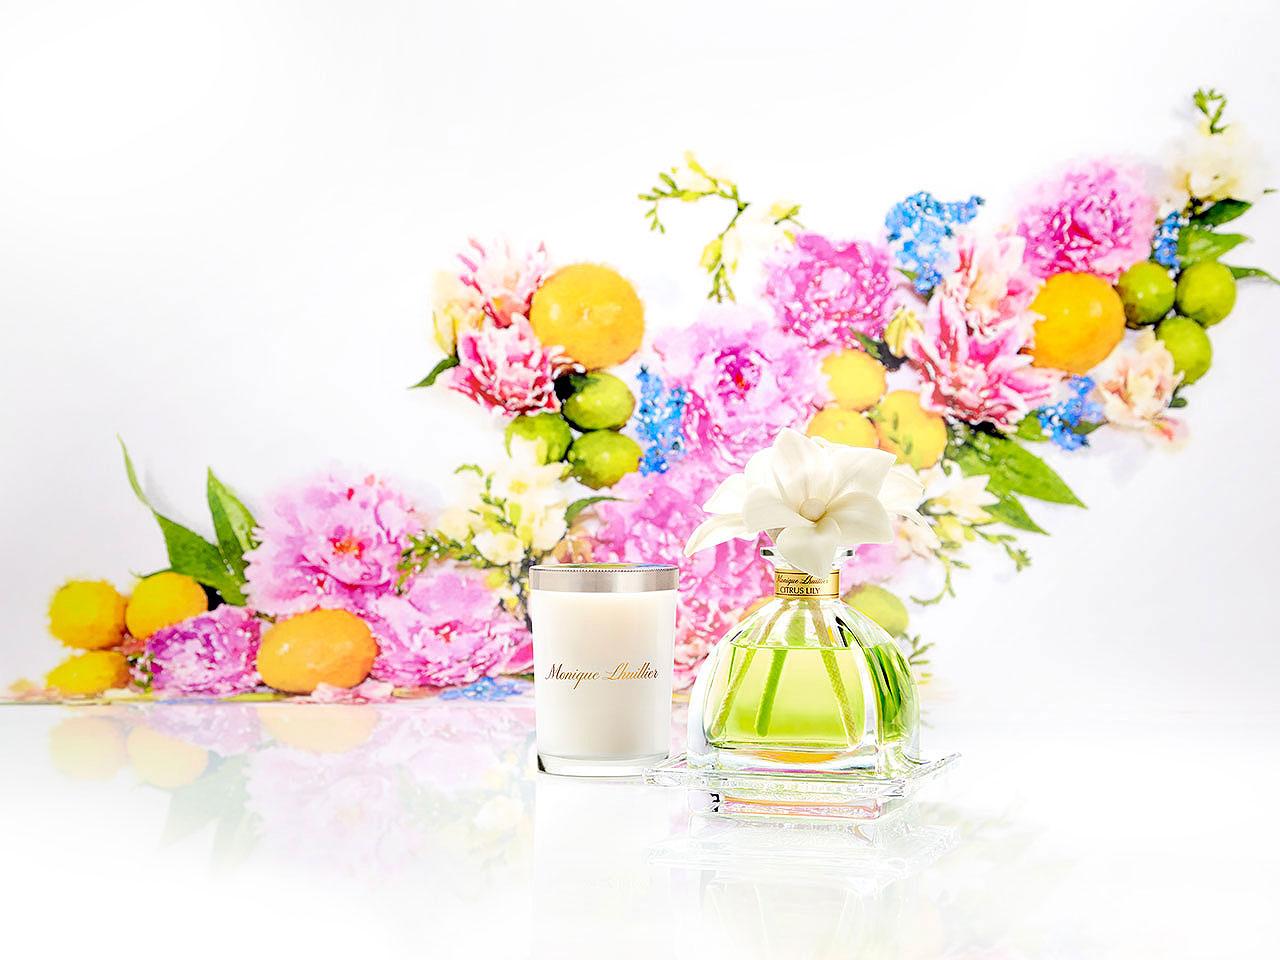 Home fragrance new